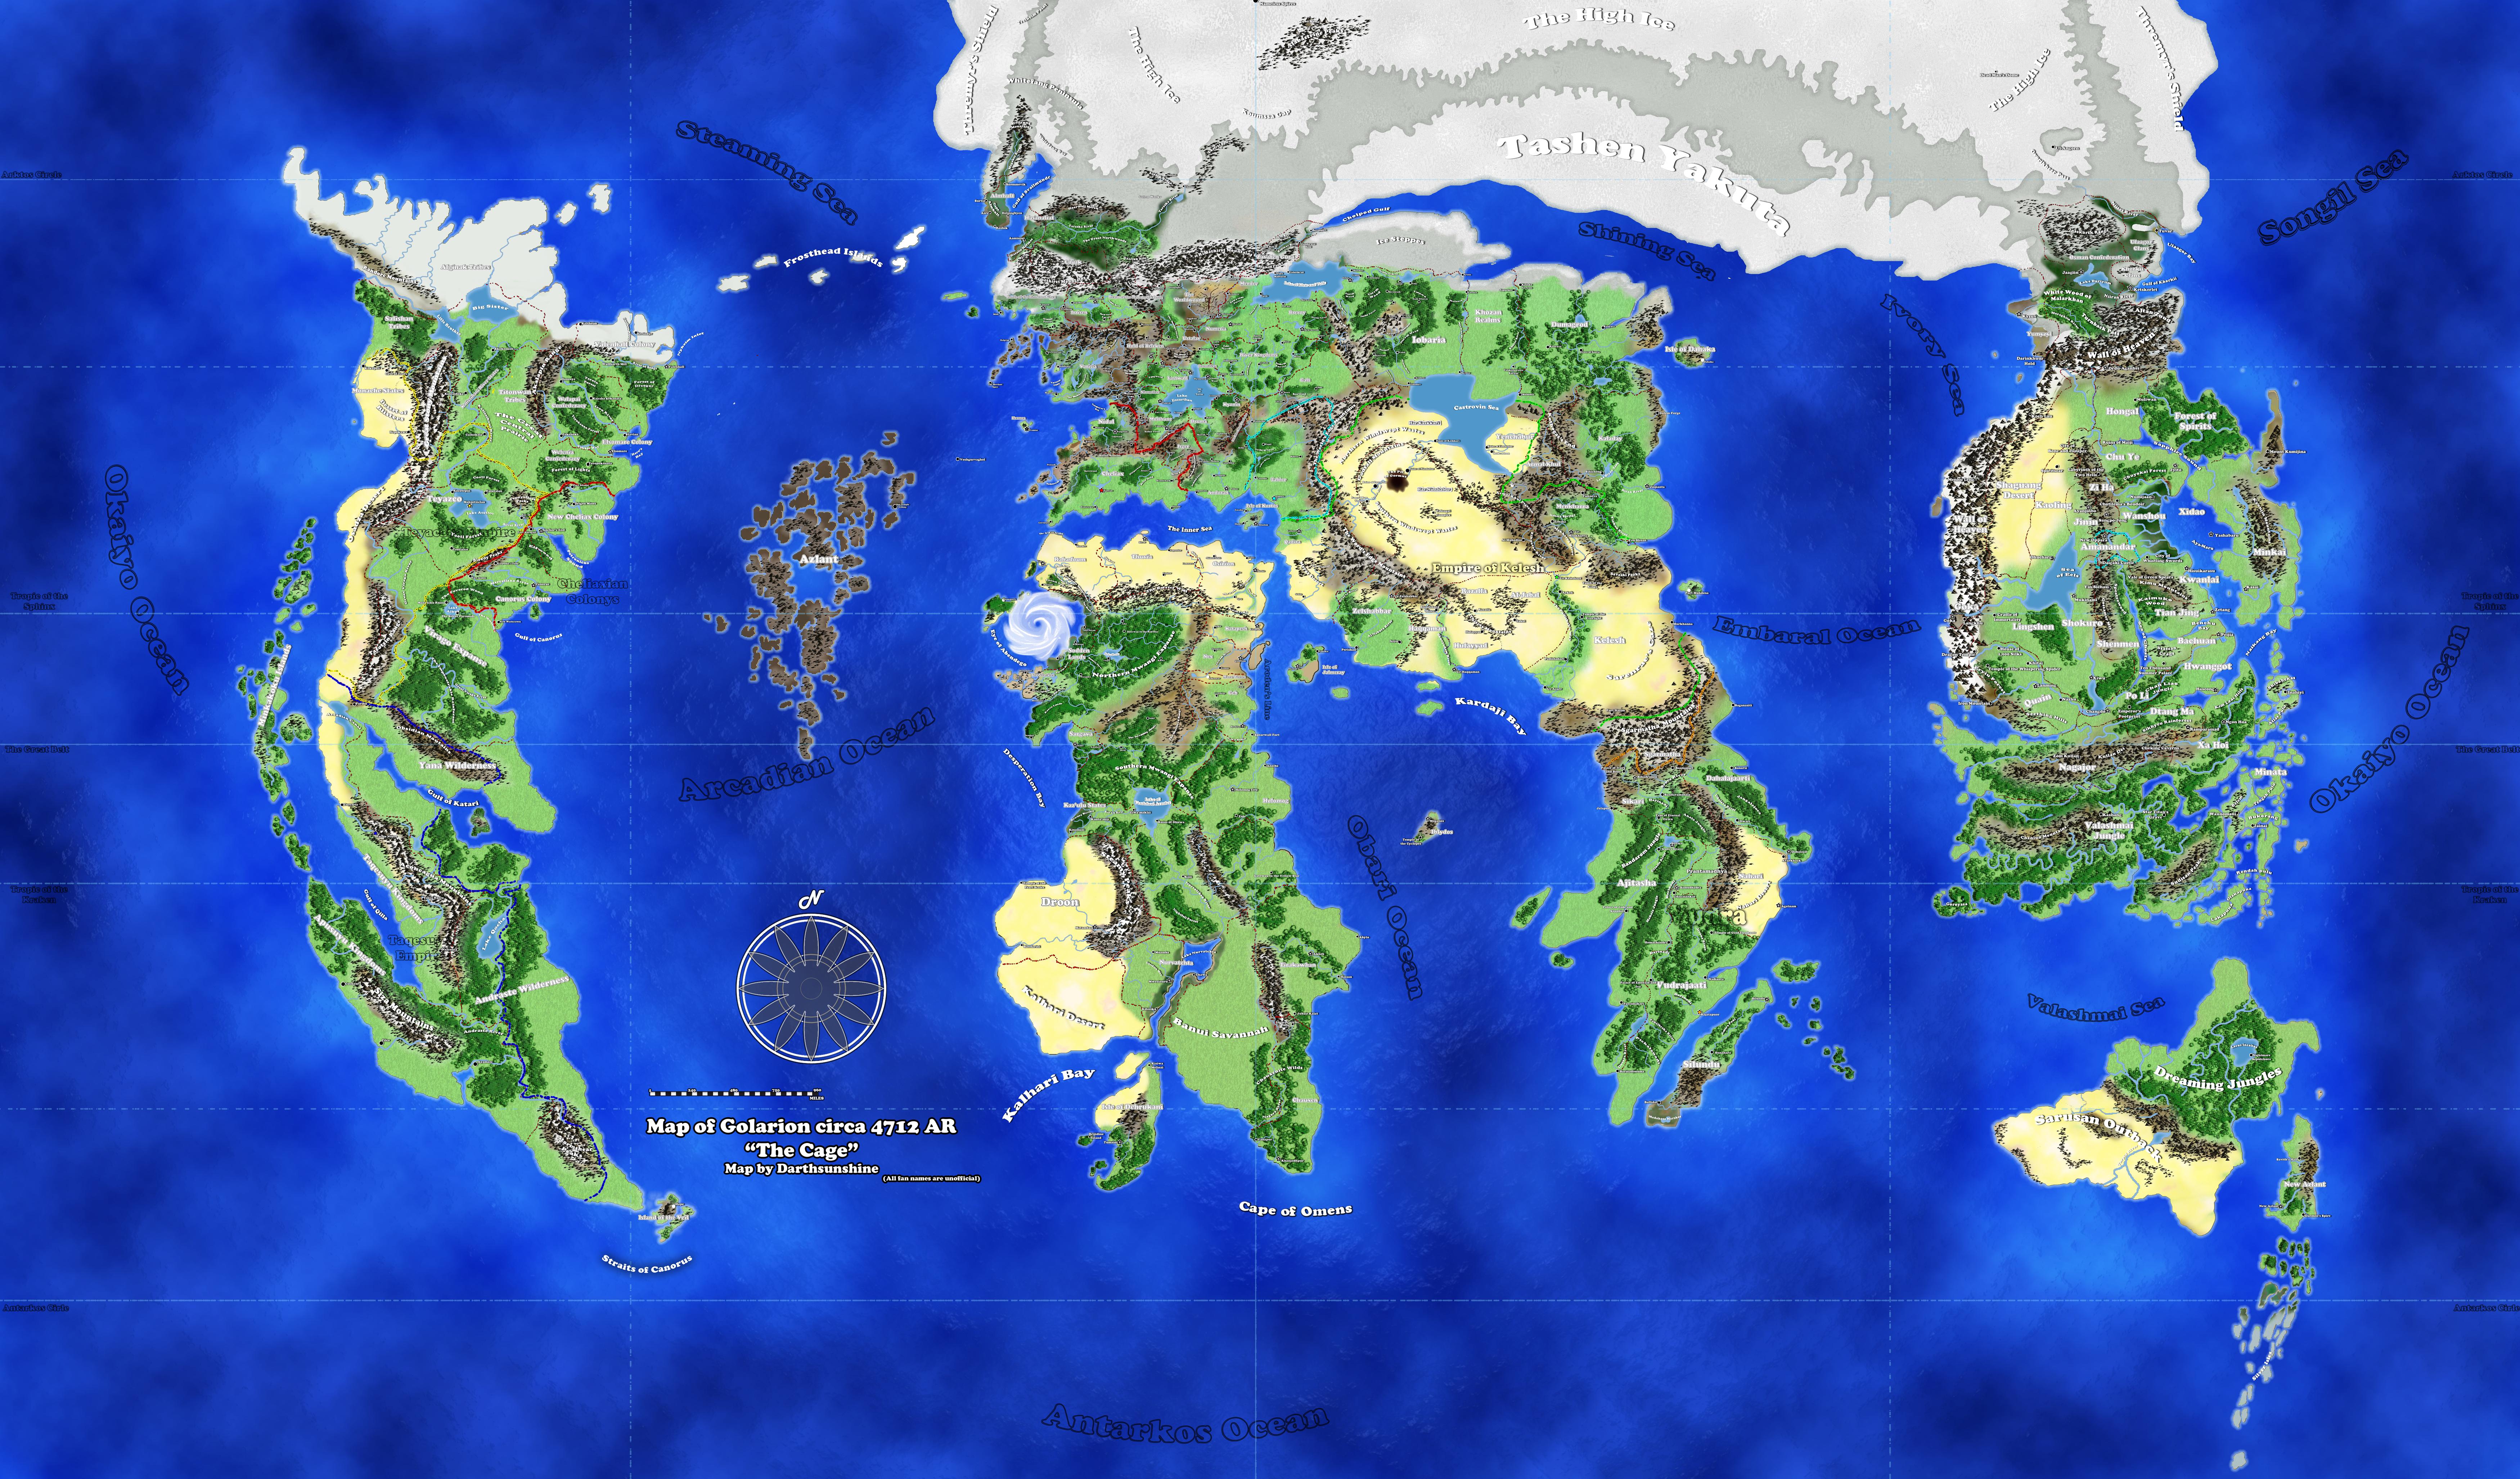 Fan-made Golarion map by DarthSunshine42 on DeviantArt on nirmathas map, darklands map, crypt of the everflame map, rust island map, tian xia map, rpg map, greyhawk map, mystara map, zakhara map, pathfinder map, toril map, magnimar map, elsir vale map, absalom map, inner sea map, ustalav map, varisia map, cerilia map, dragonlance world map, river kingdoms map,